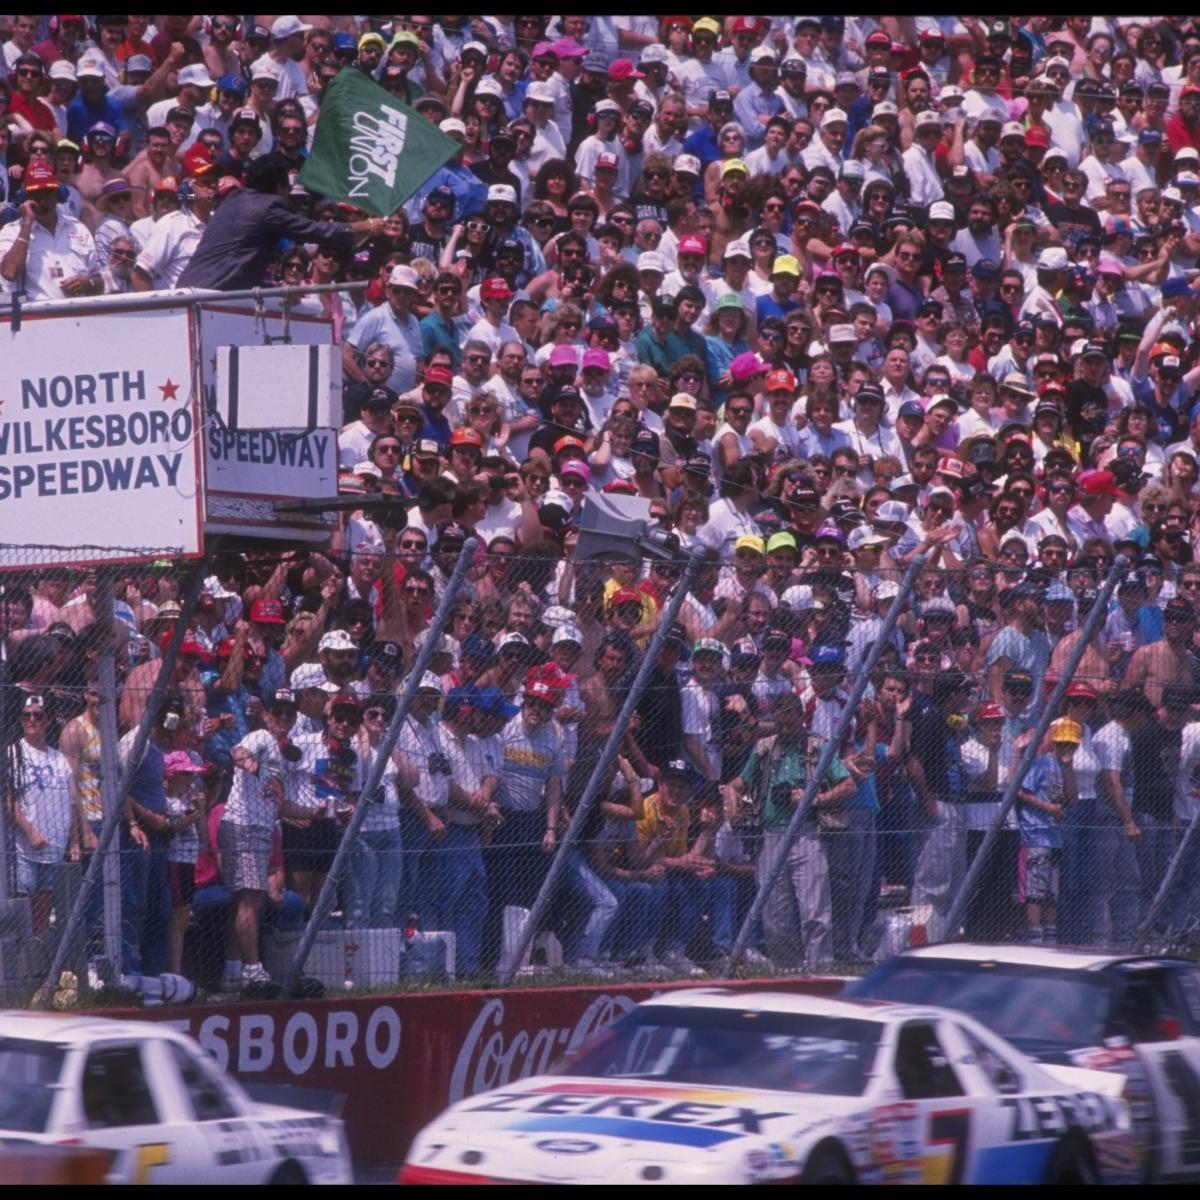 Should NASCAR Bring Back North Wilkesboro?